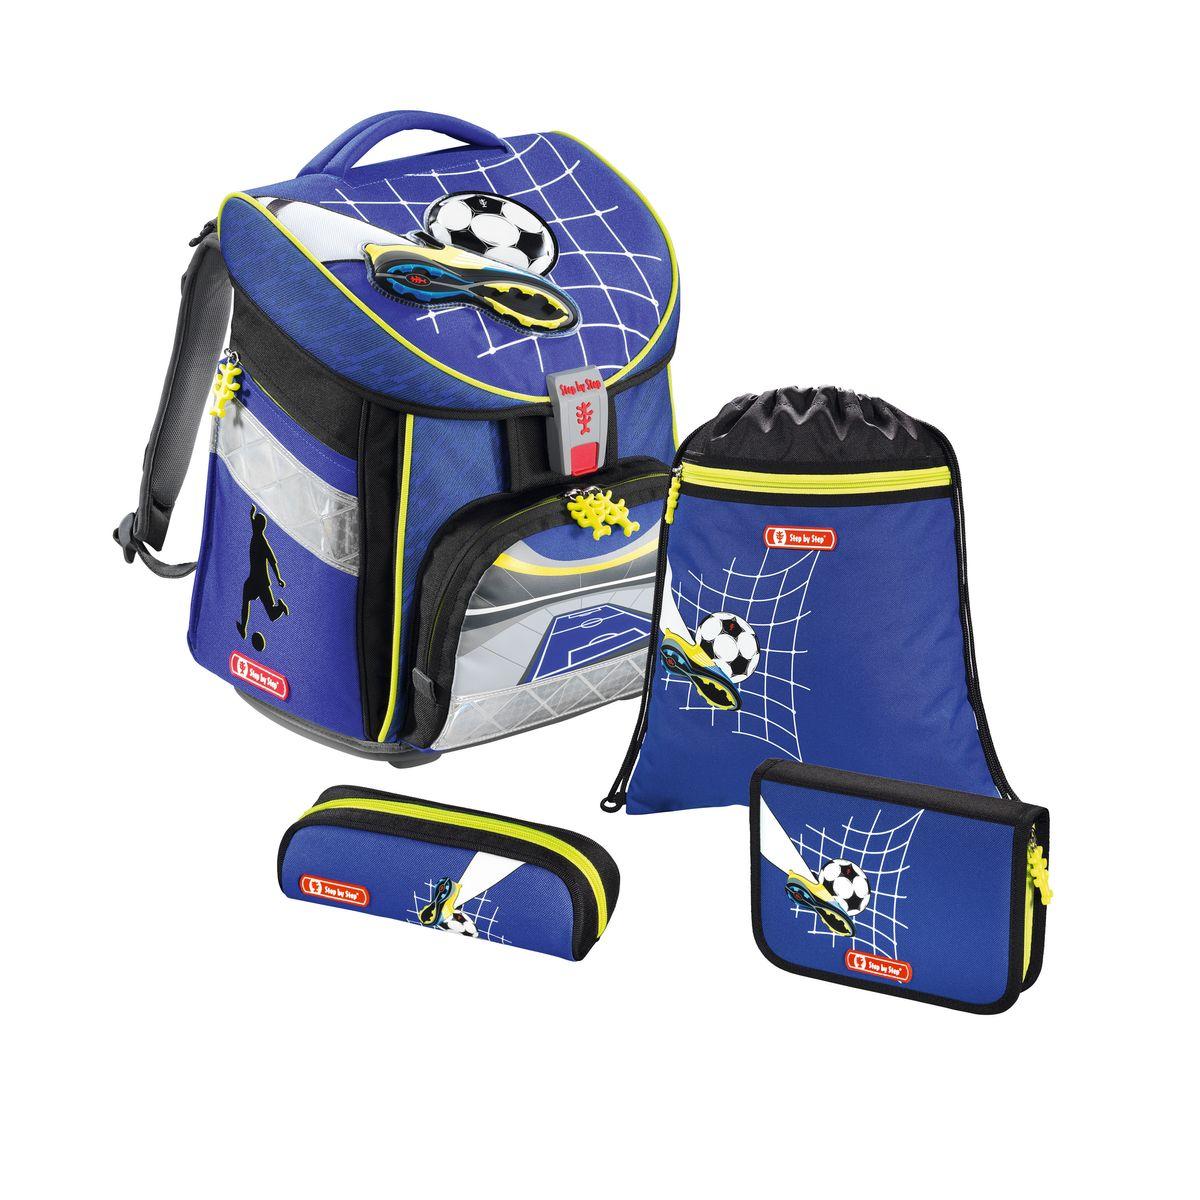 Hama Ранец школьный для мальчика Step By Step Comfort Top Soccer с наполнением eowyn kerr insight guides rome step by step